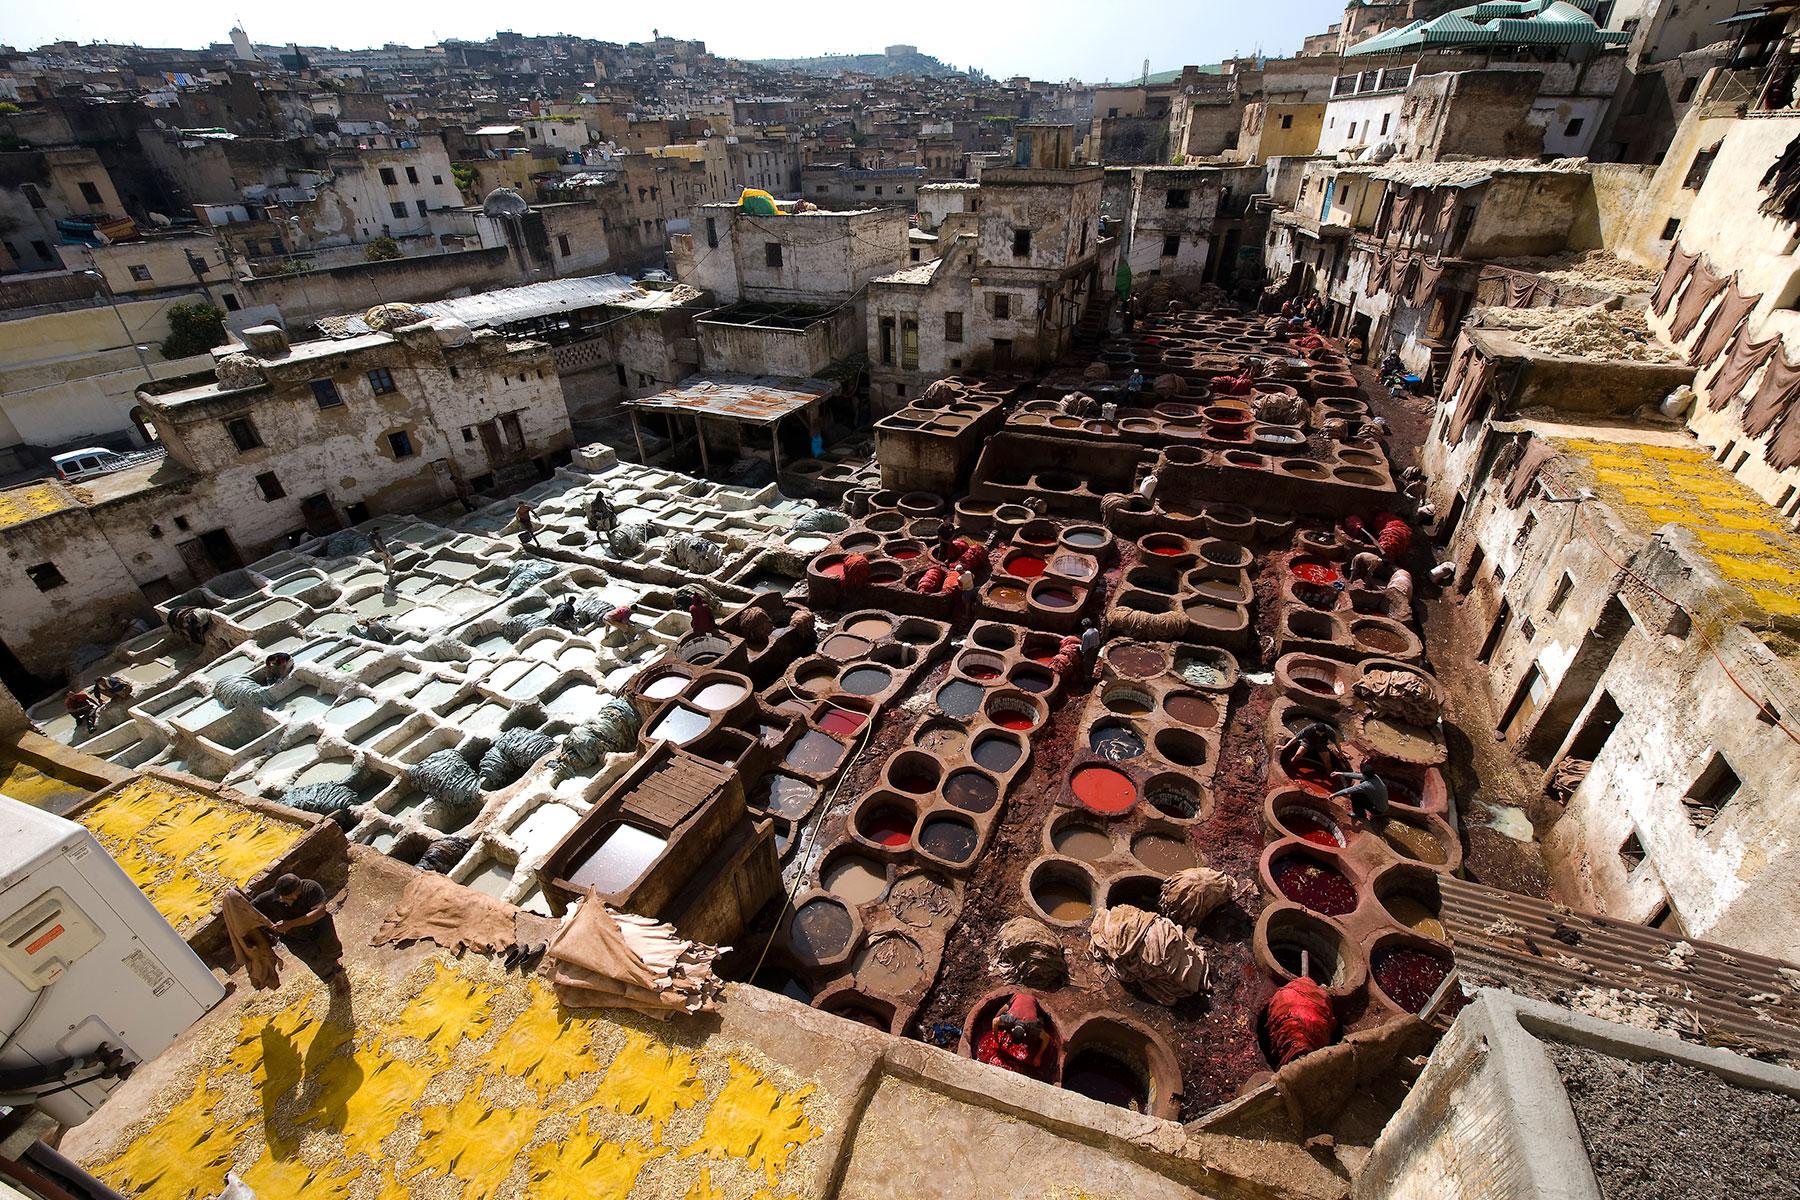 Marocco2.jpg